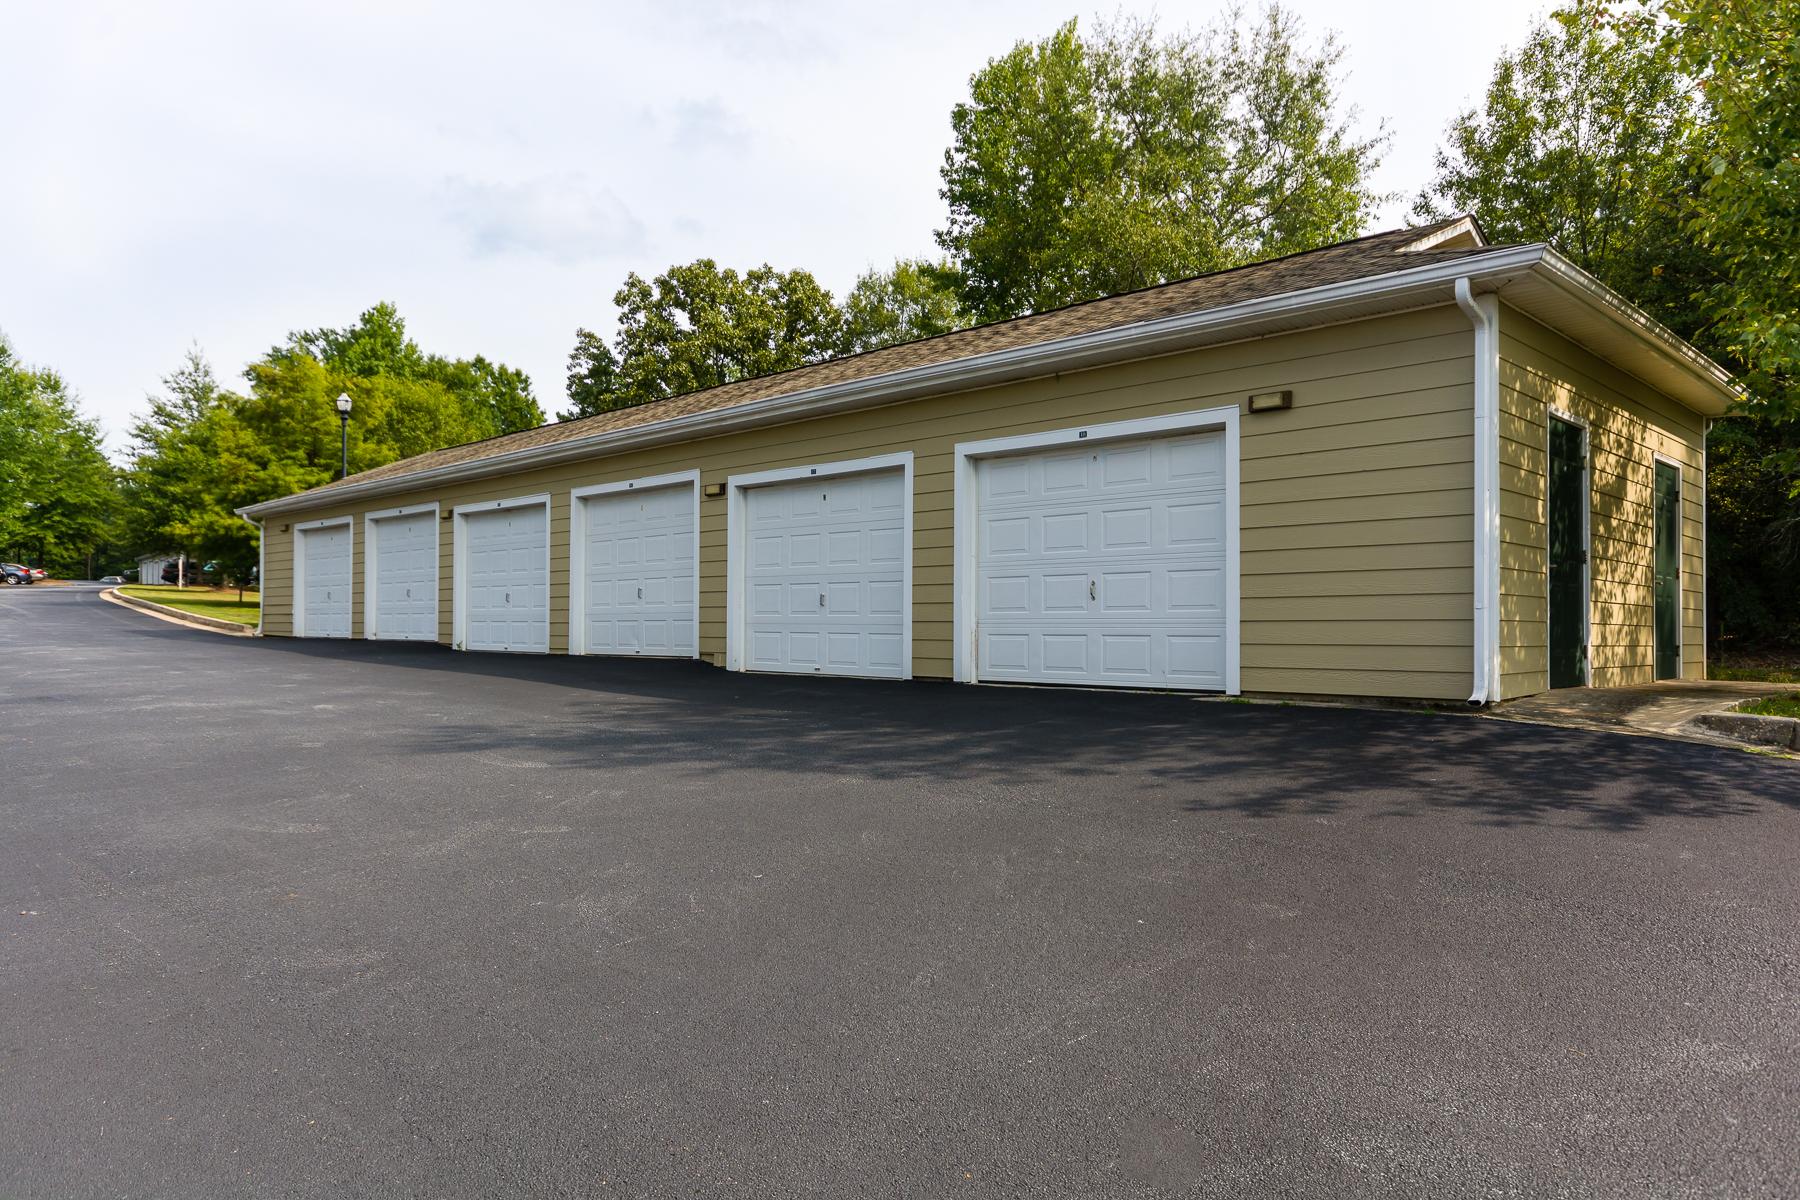 Detached Garages | Village at Almand Creek Apartments Conyers, GA